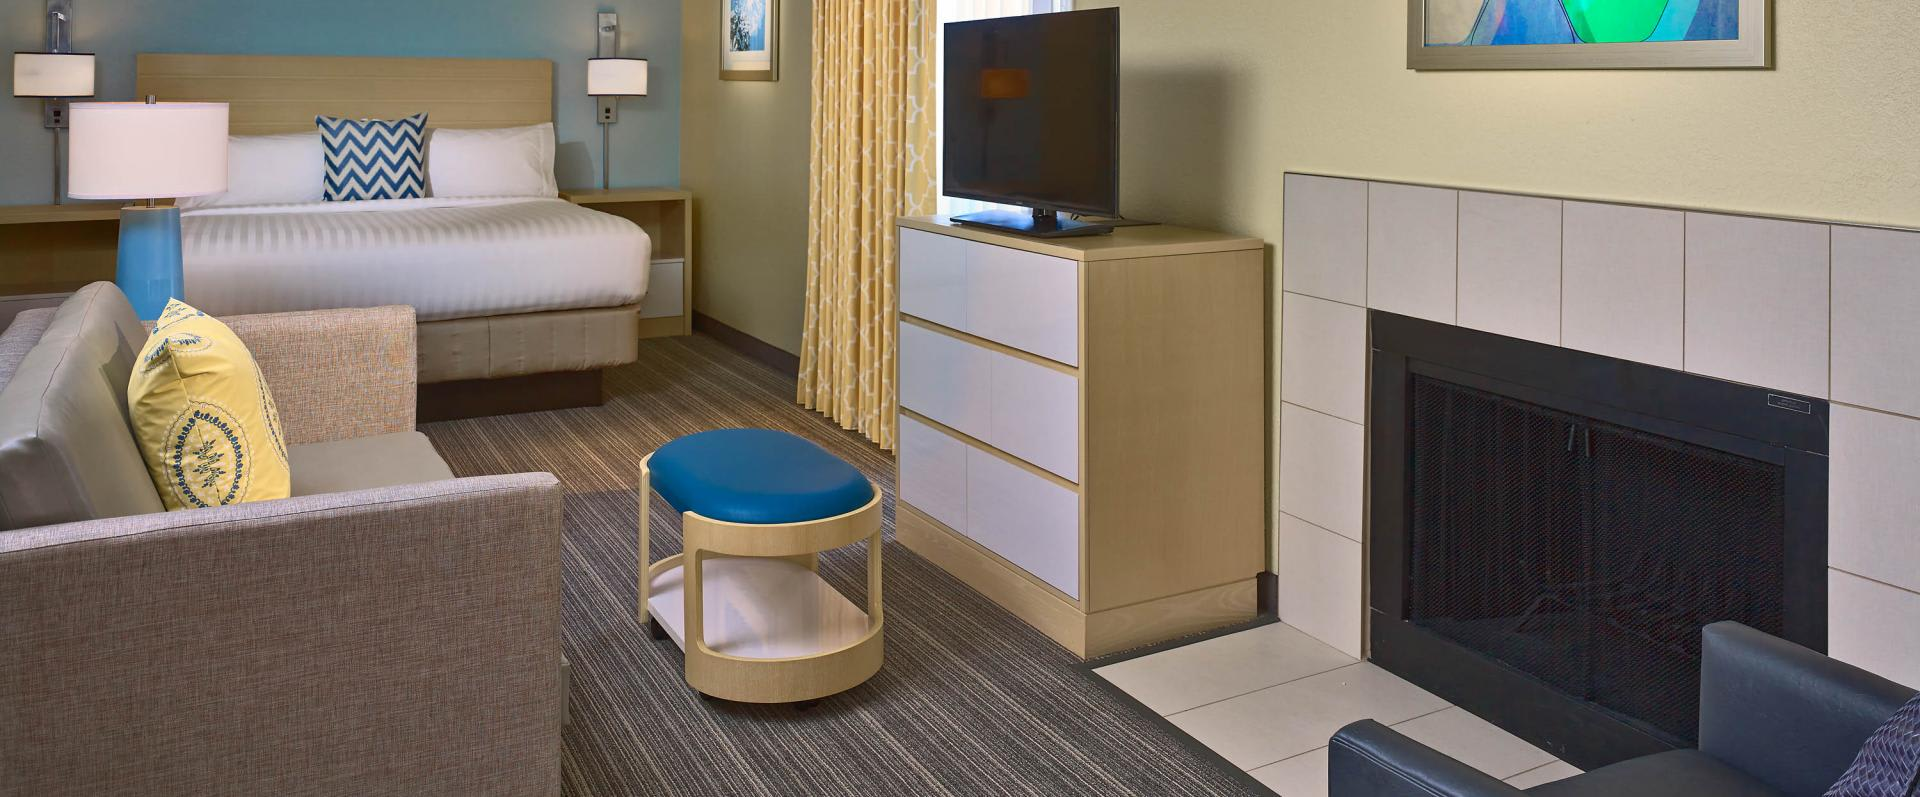 Suite Bedroom Entertainment